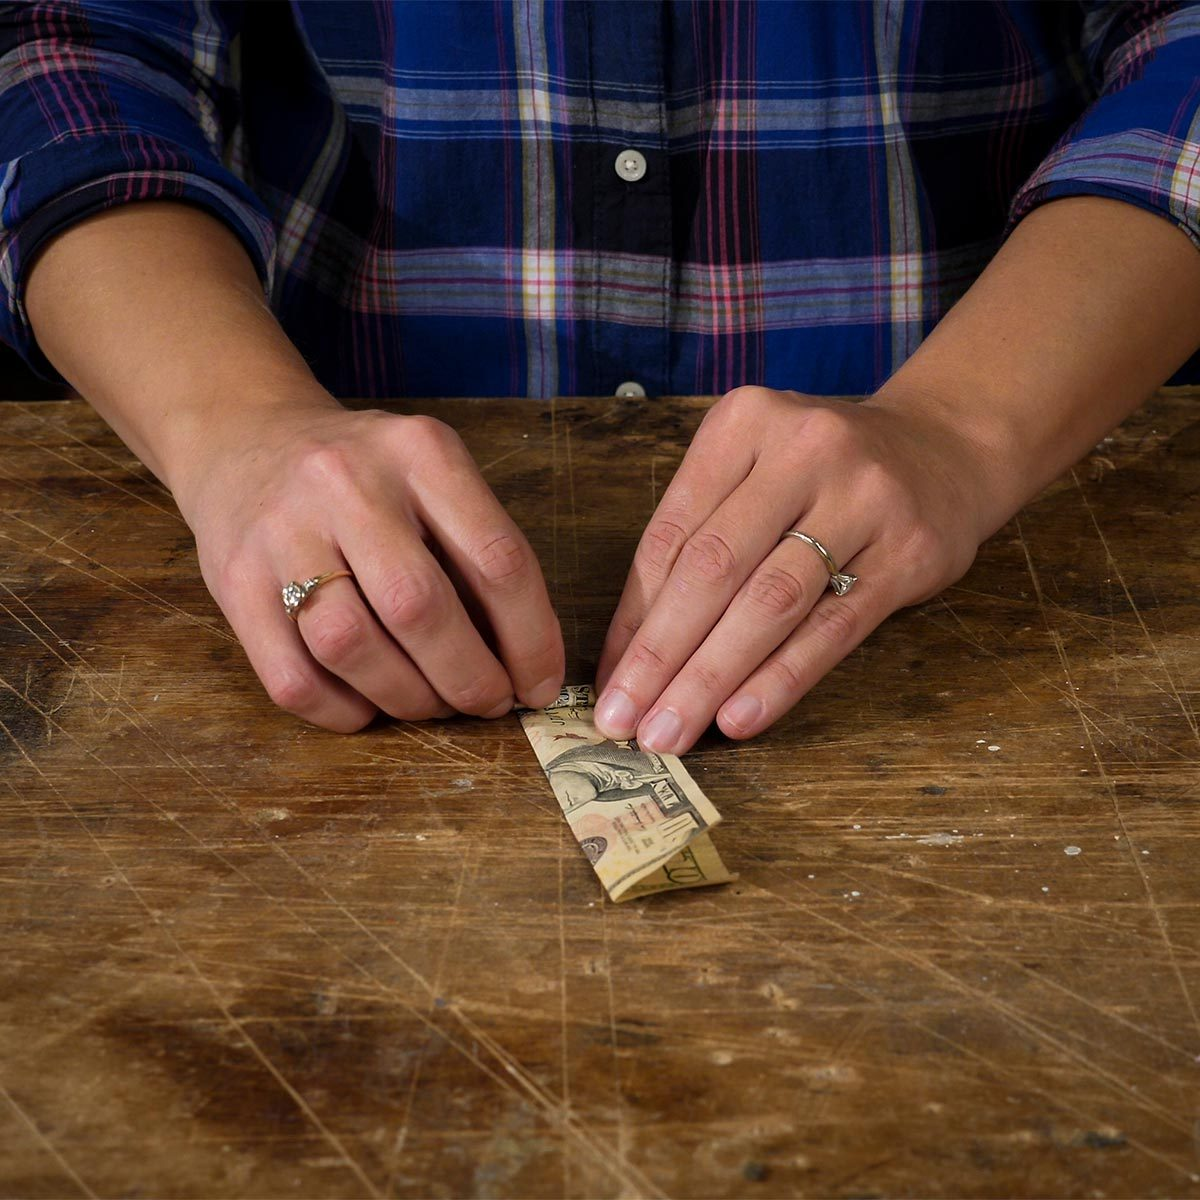 rolling money for cash stash